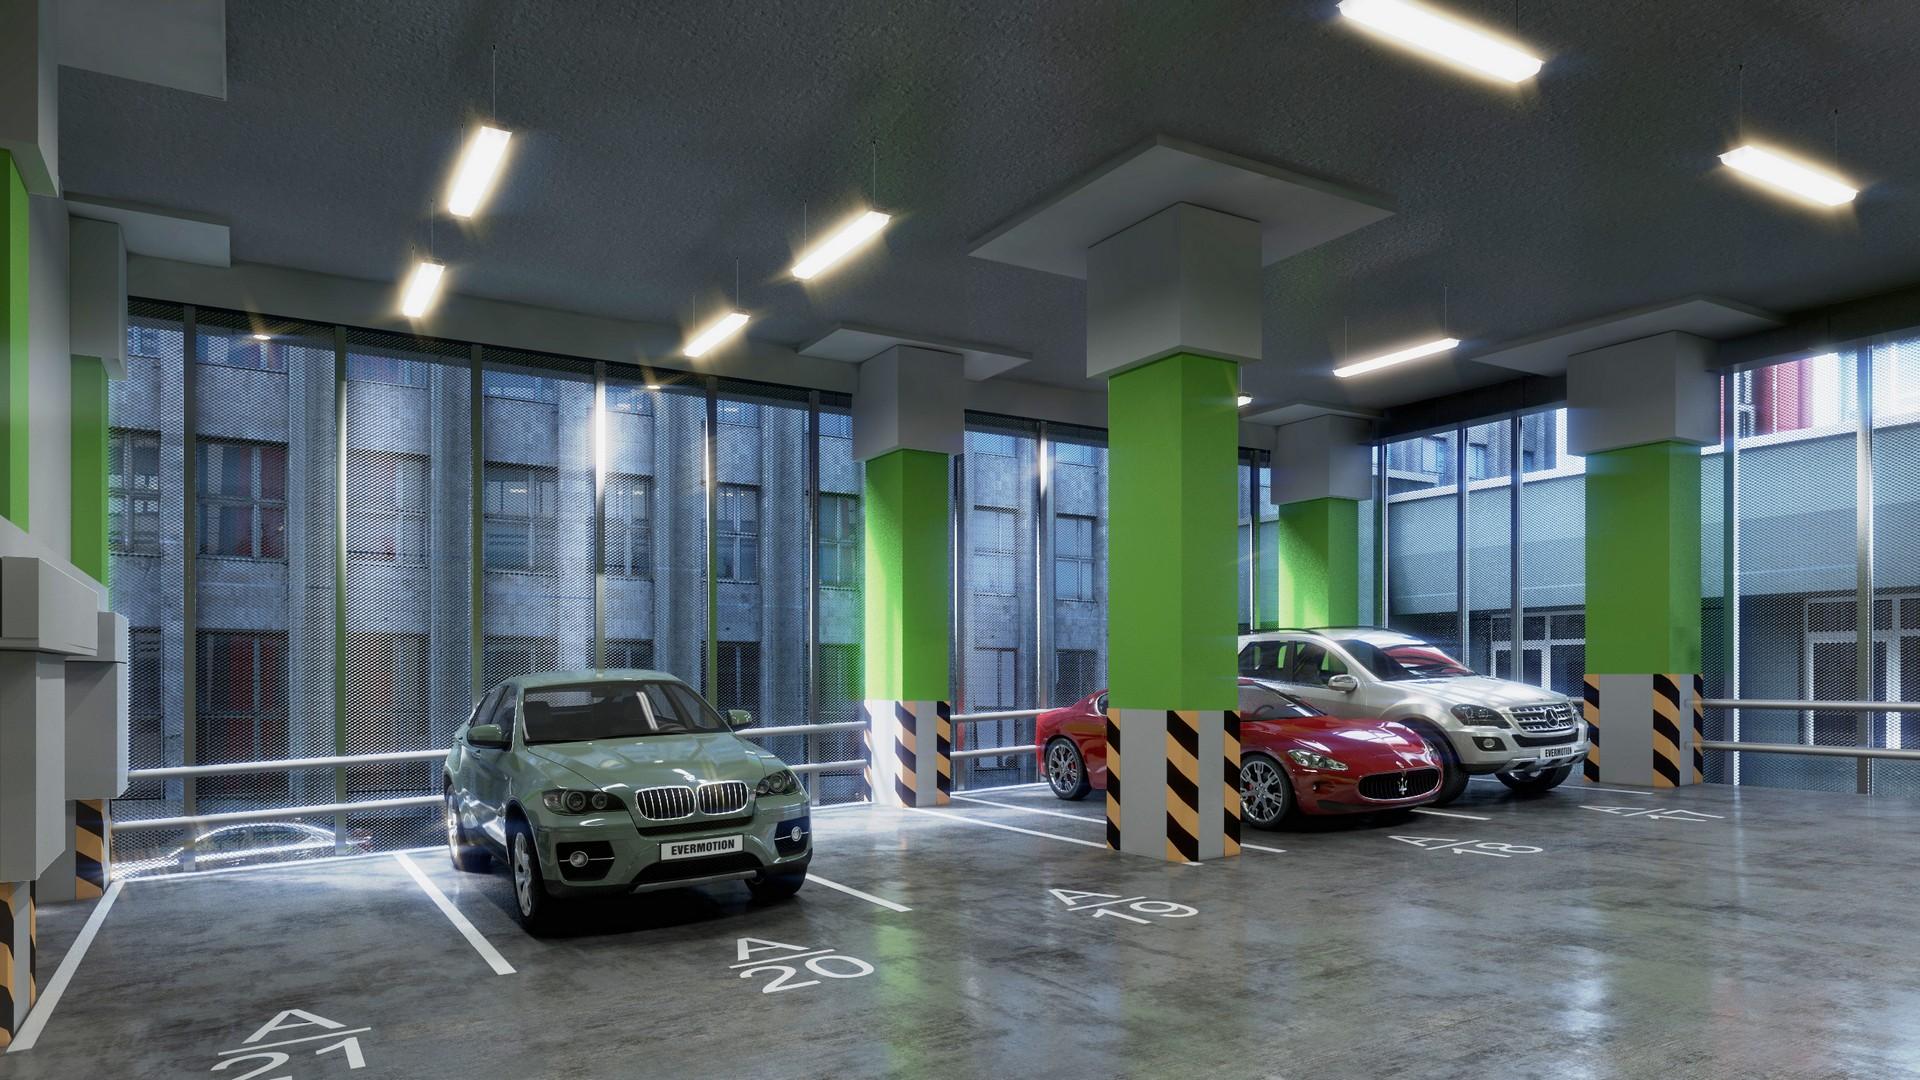 029 parking